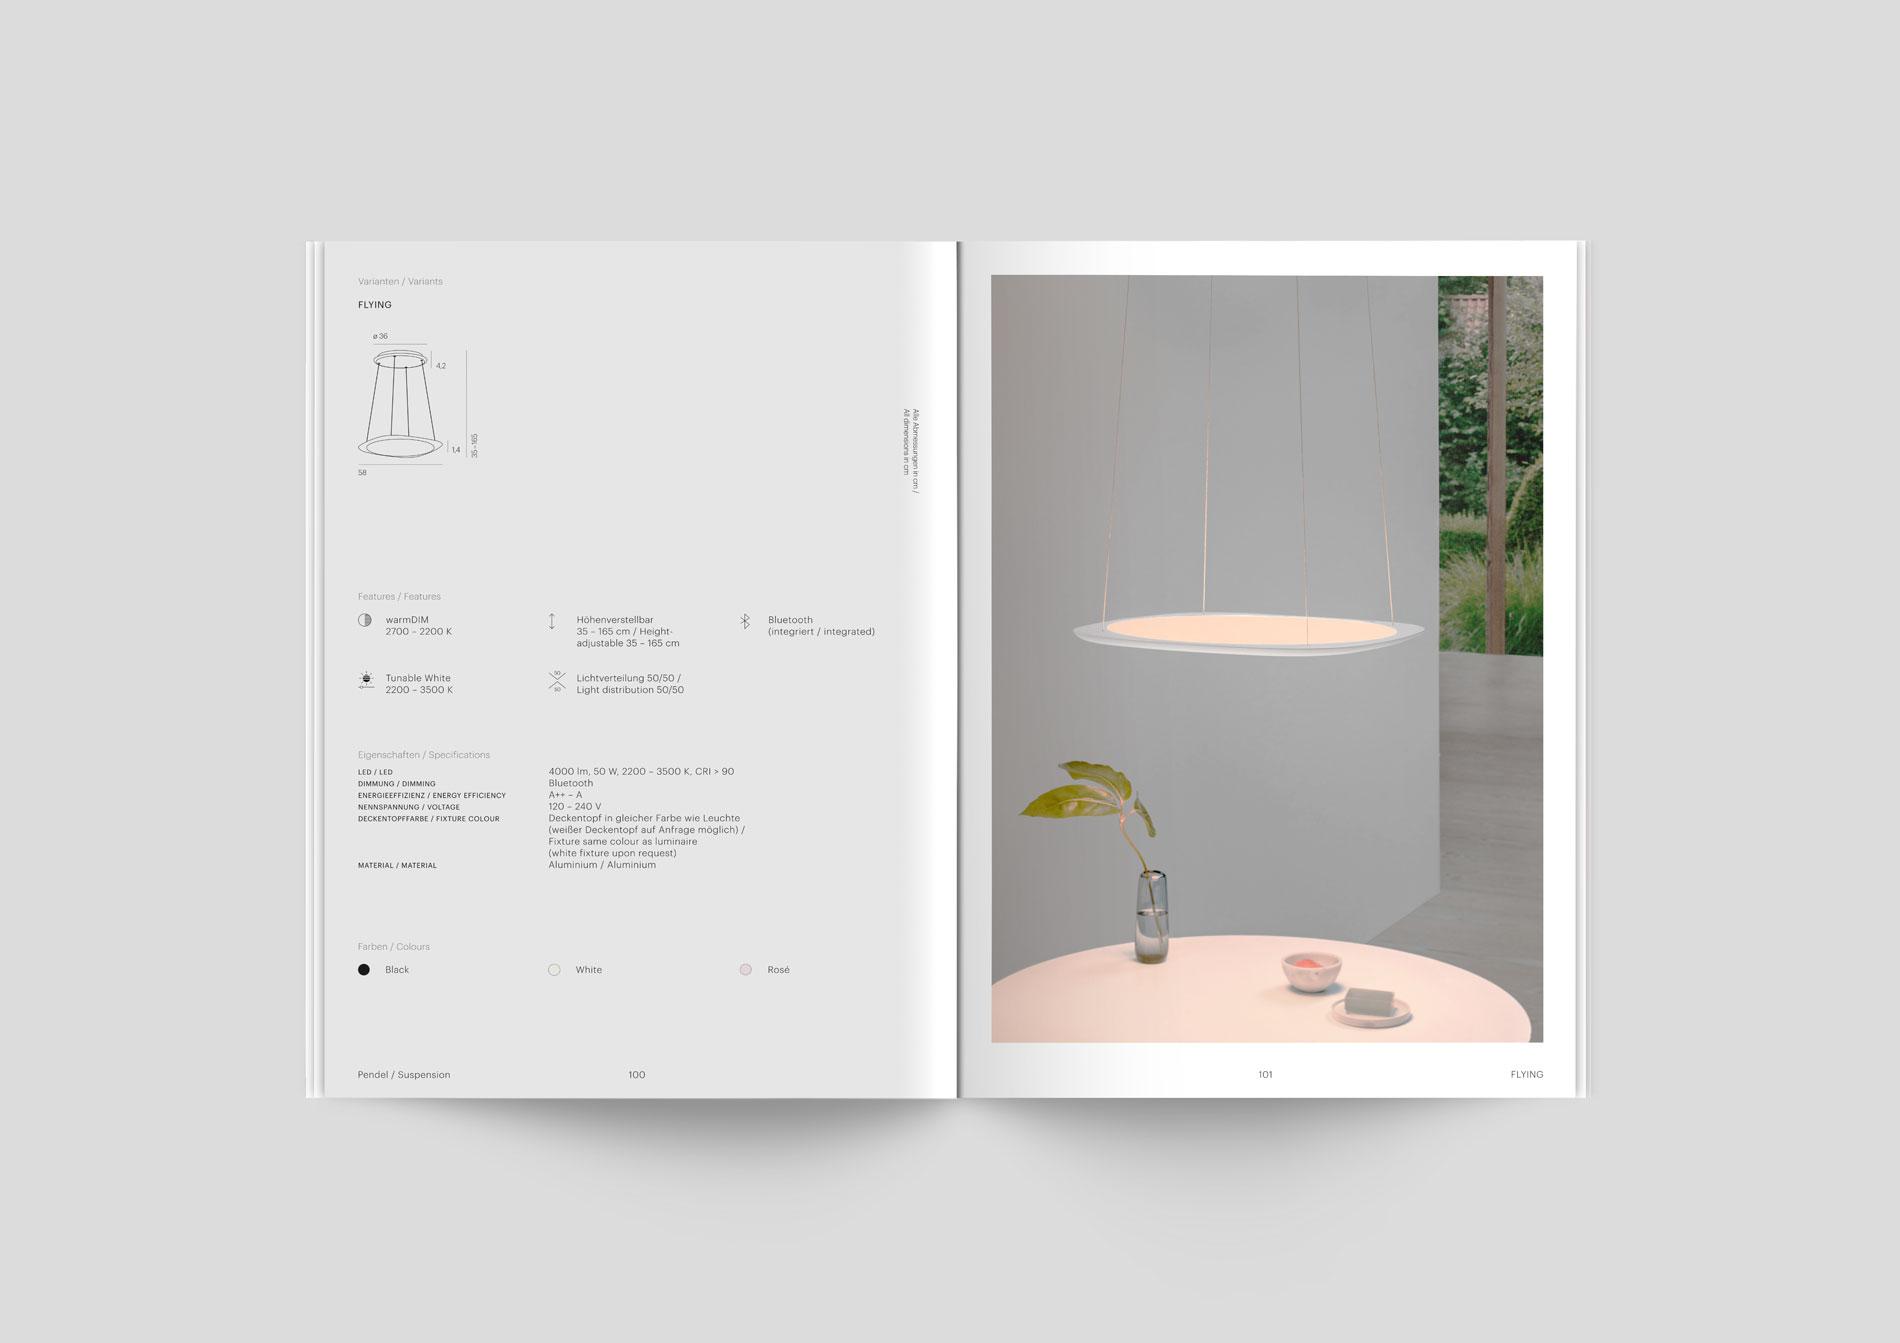 nicoletta-dalfino-tobias-grau-catalogue-2019-15